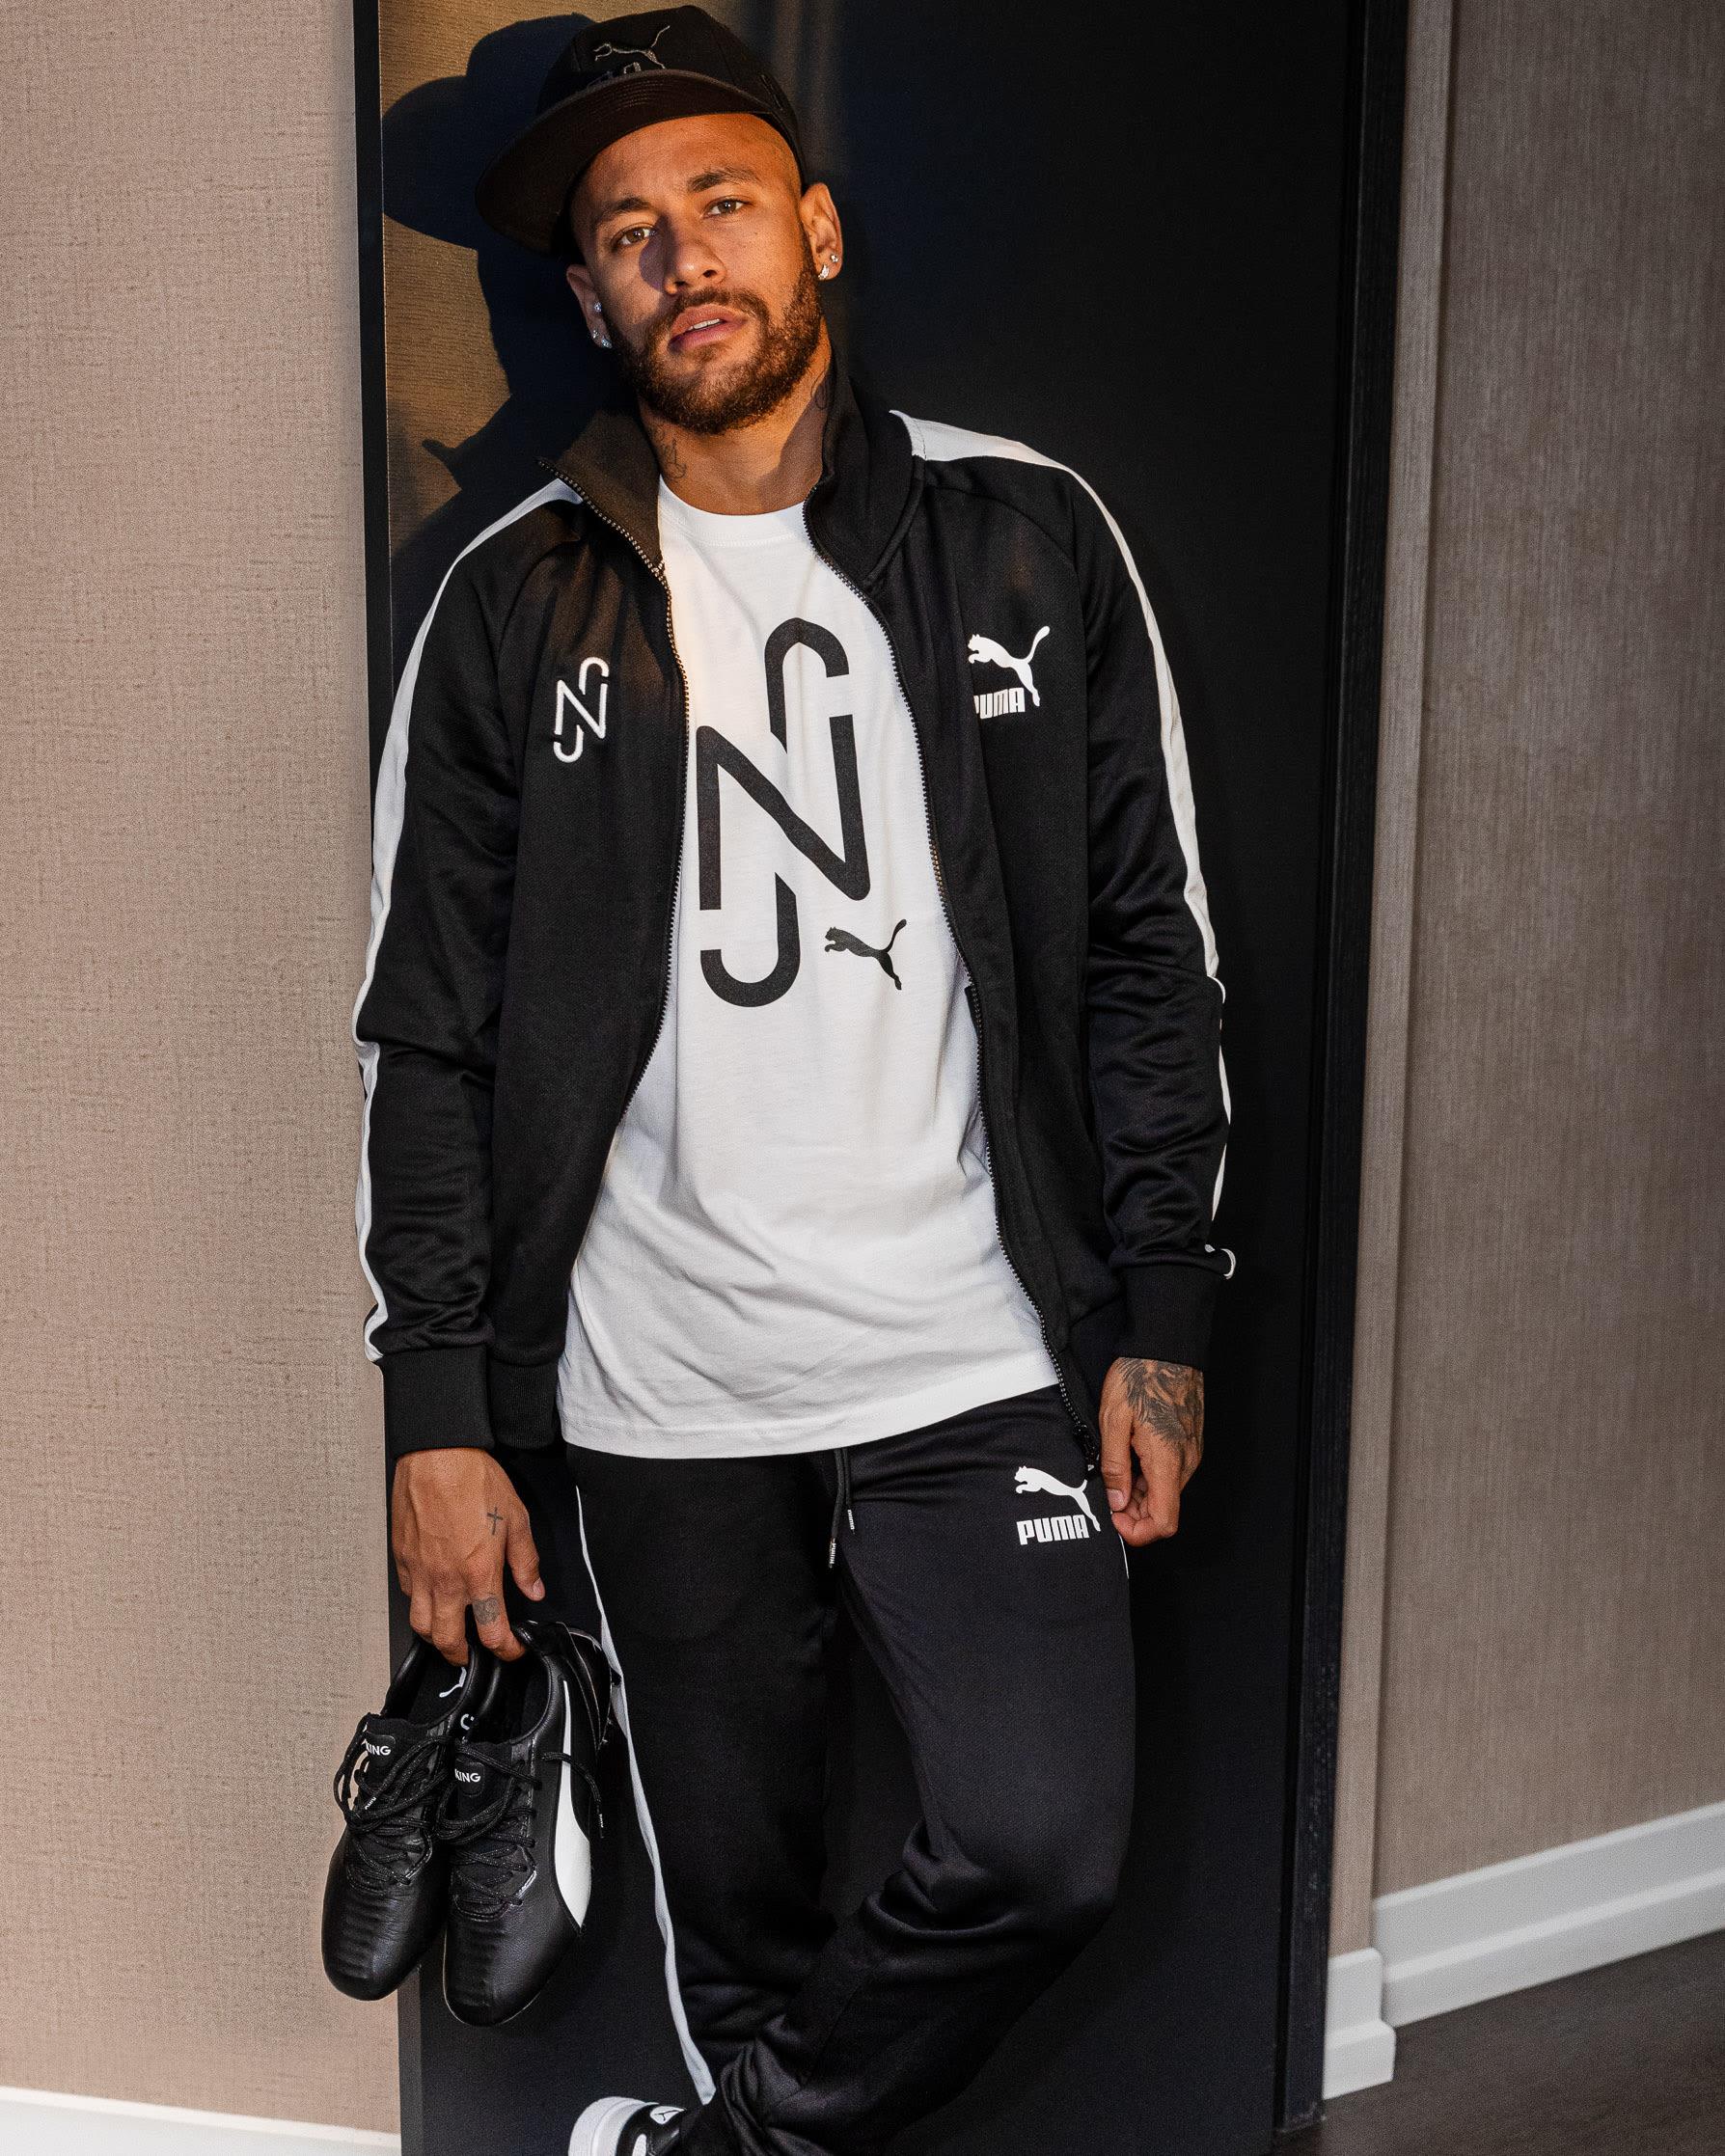 Neymar Puma Endorsement Deal